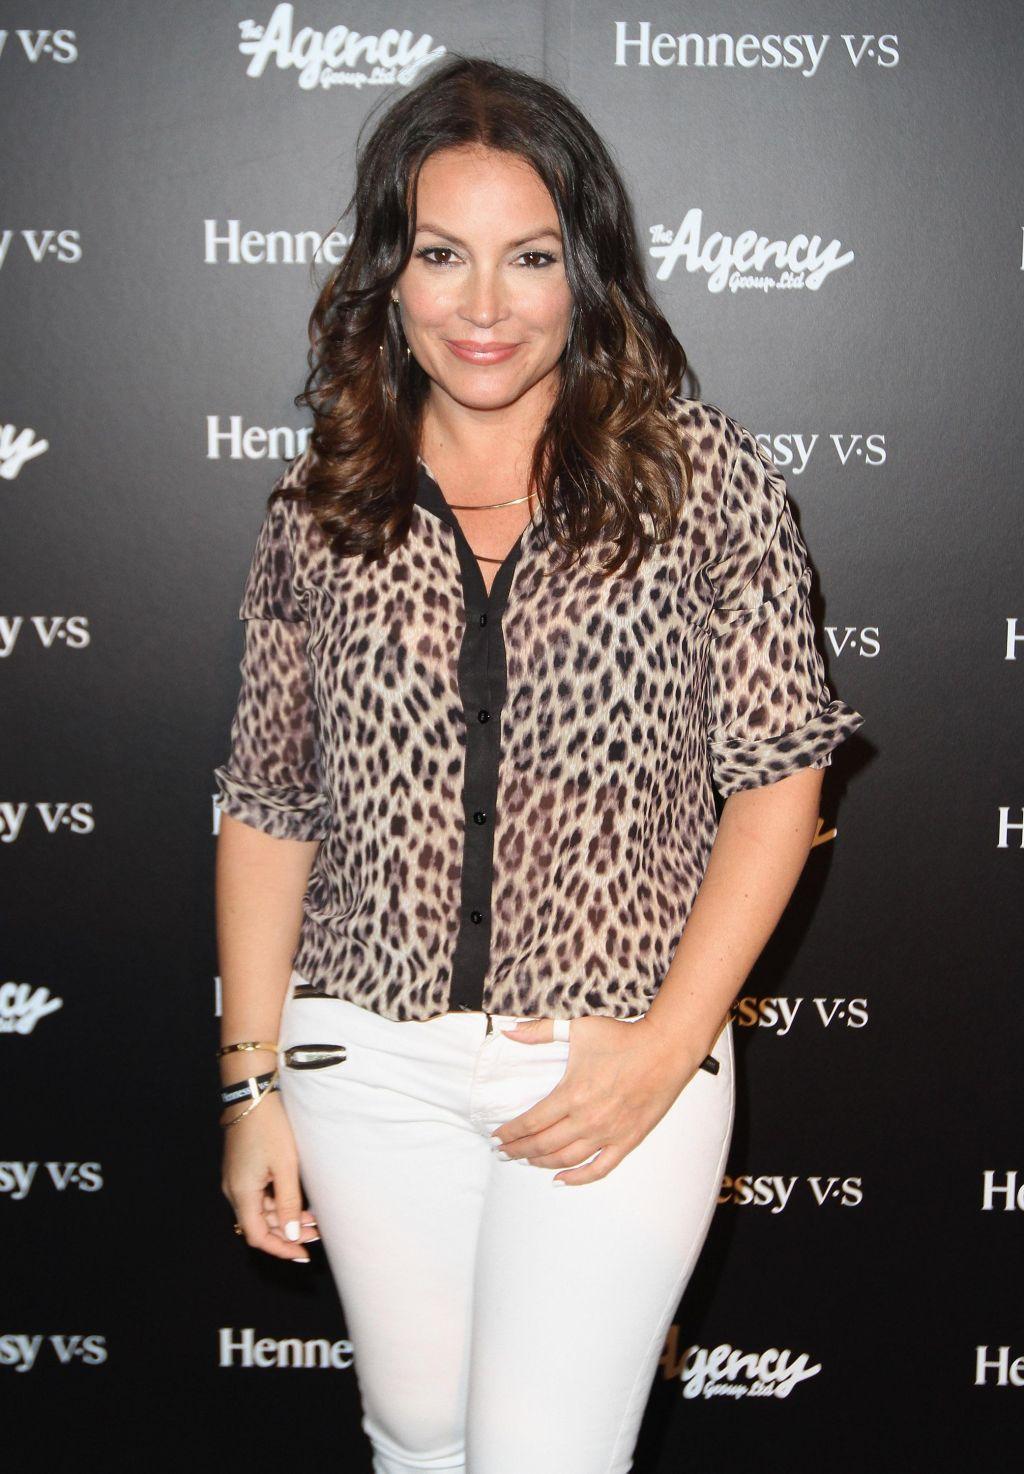 Hennessy VS VMA Celebration